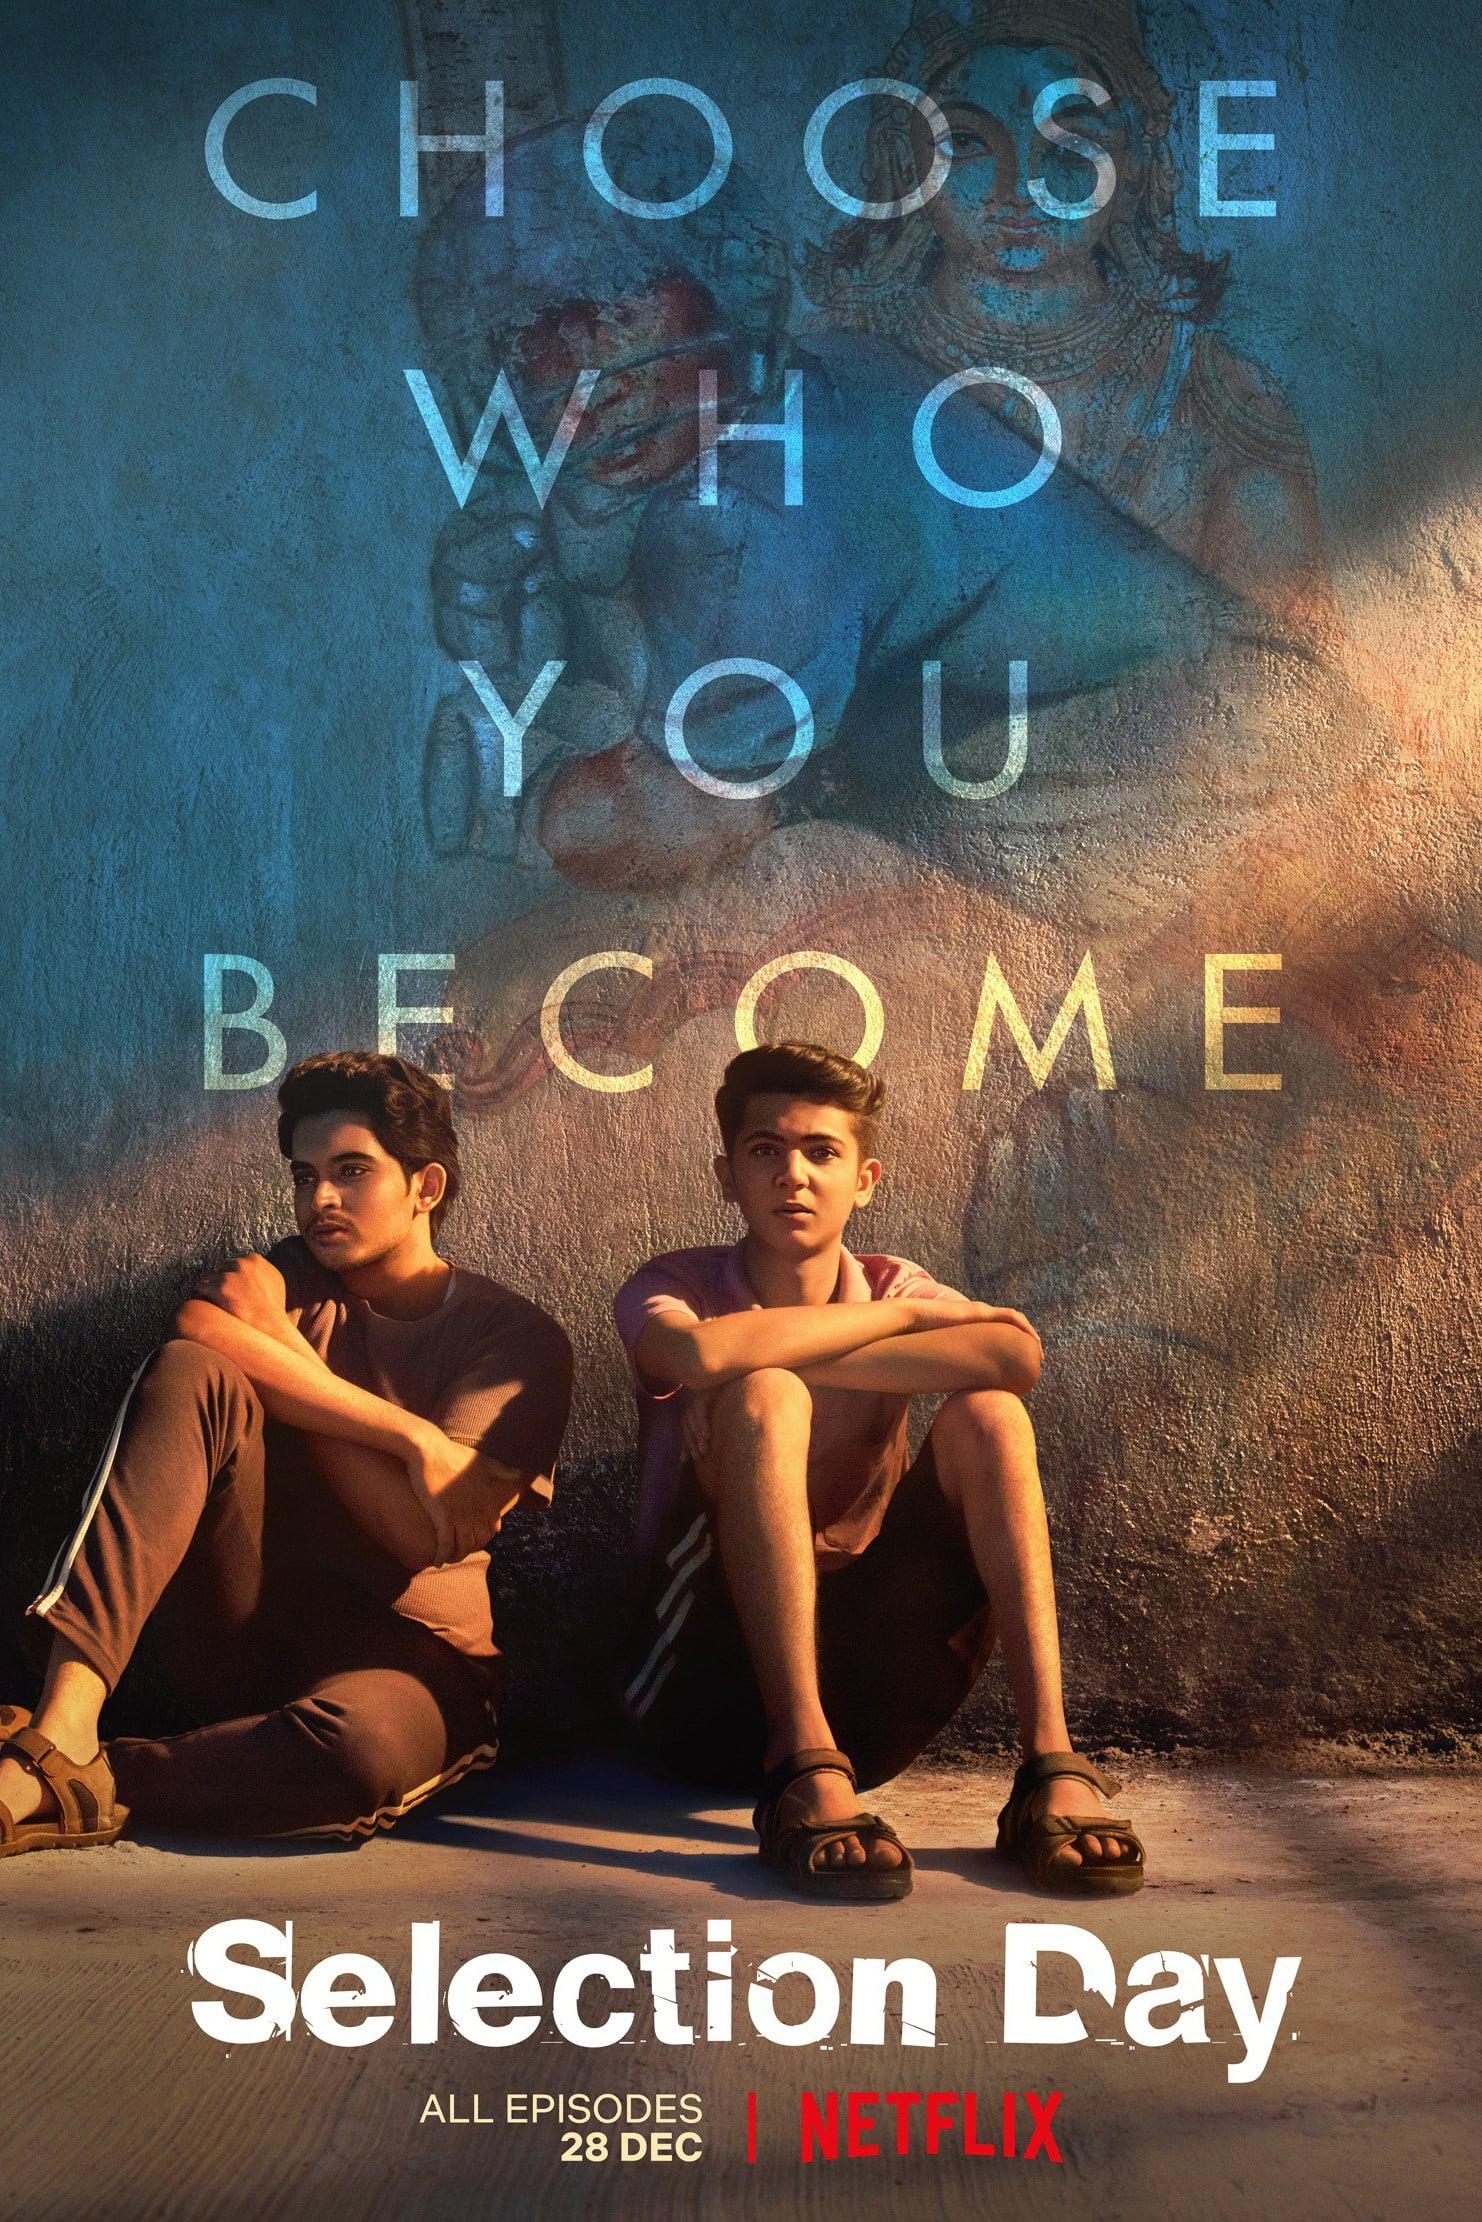 Season 2 of Selection Day - Soon On Netflix